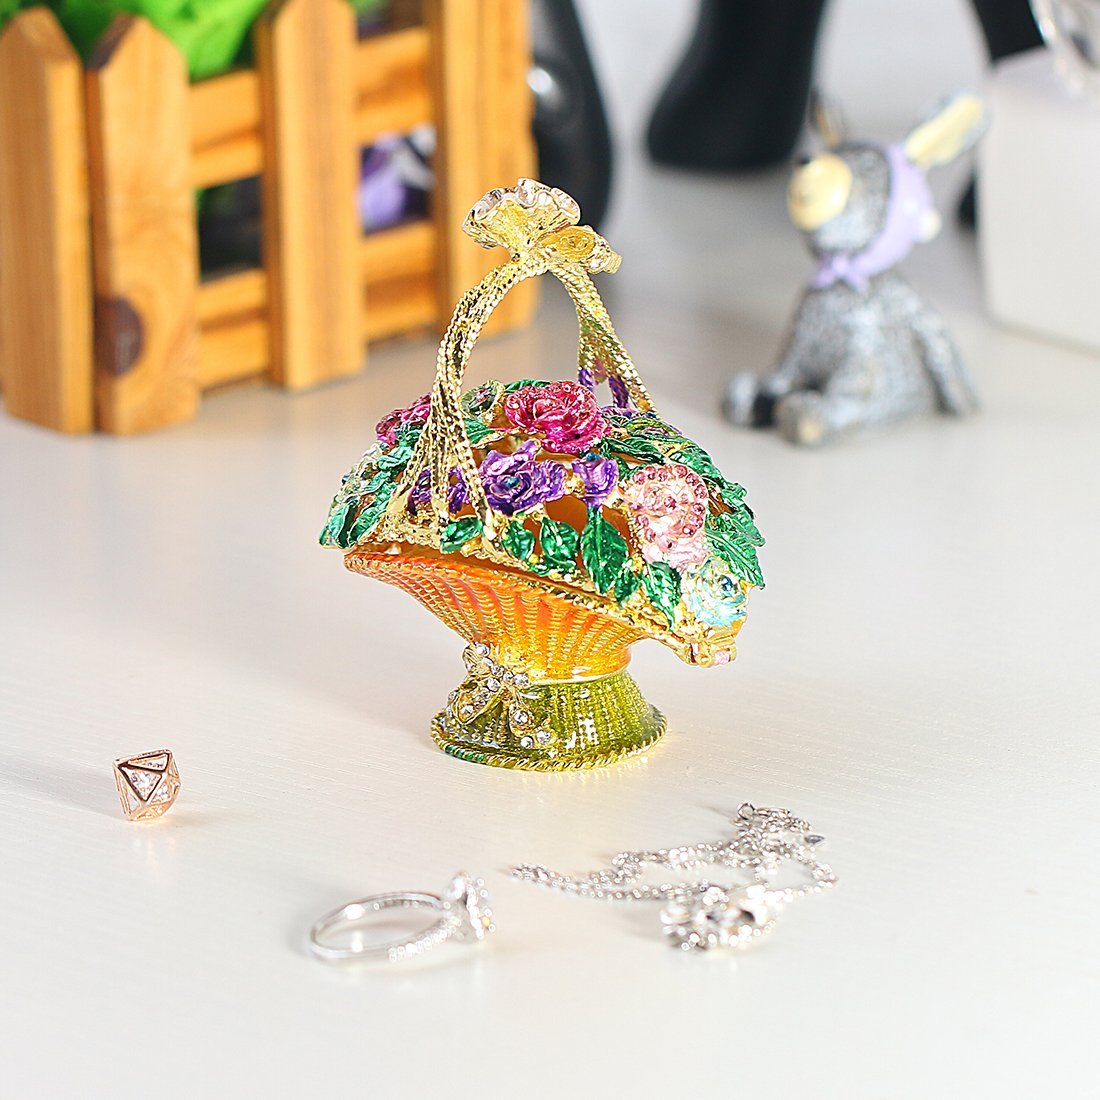 YUFENG Flowered Basket Pewter Figurine Box Crystal, Jewelry Box, Keepsake Gift